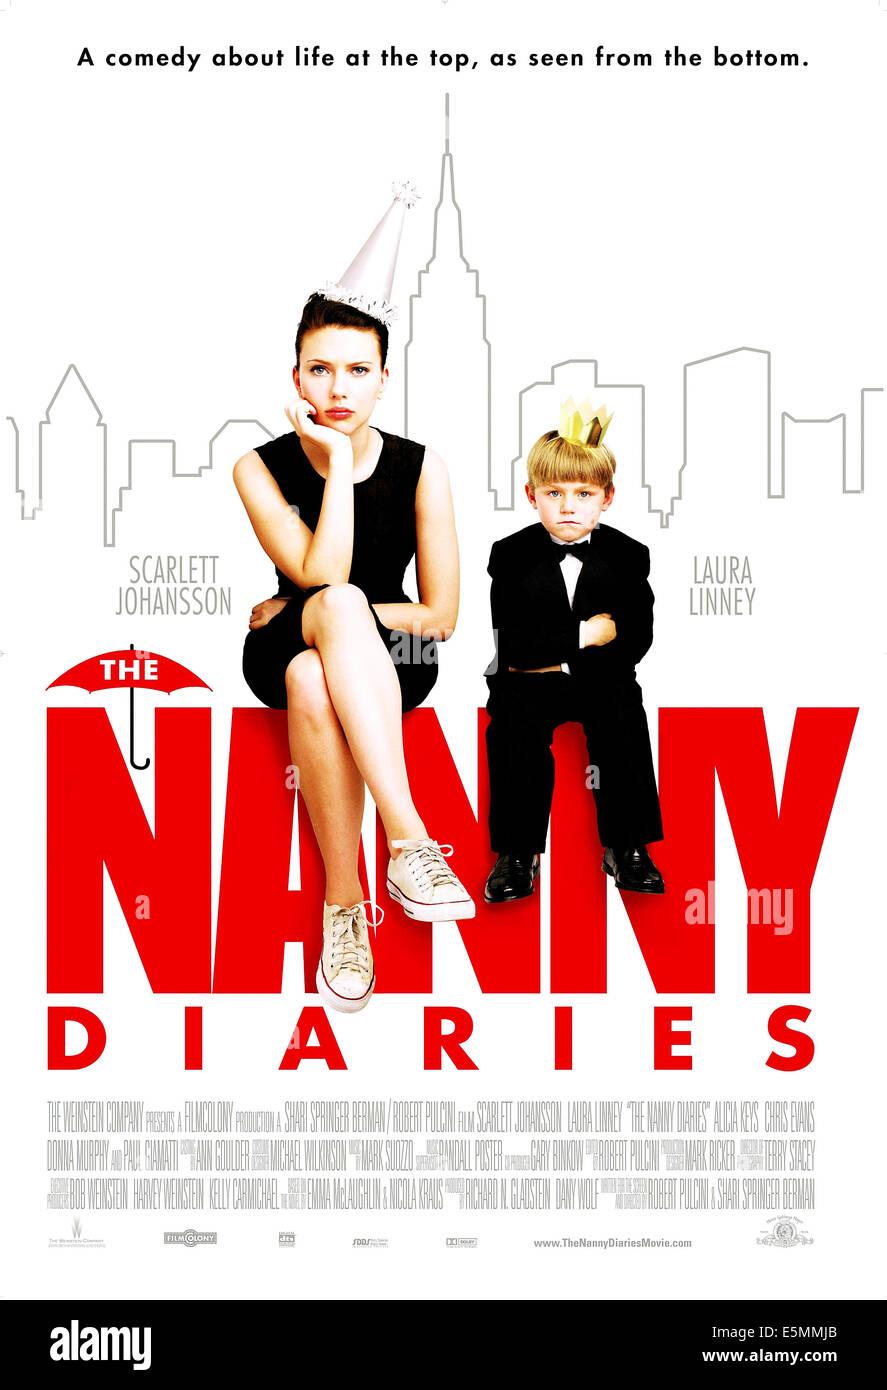 THE NANNY DIARIES, Scarlett Johansson, Nicholas Art, 2007. ©Weinstein Company/Courtesy Everett Collection - Stock Image